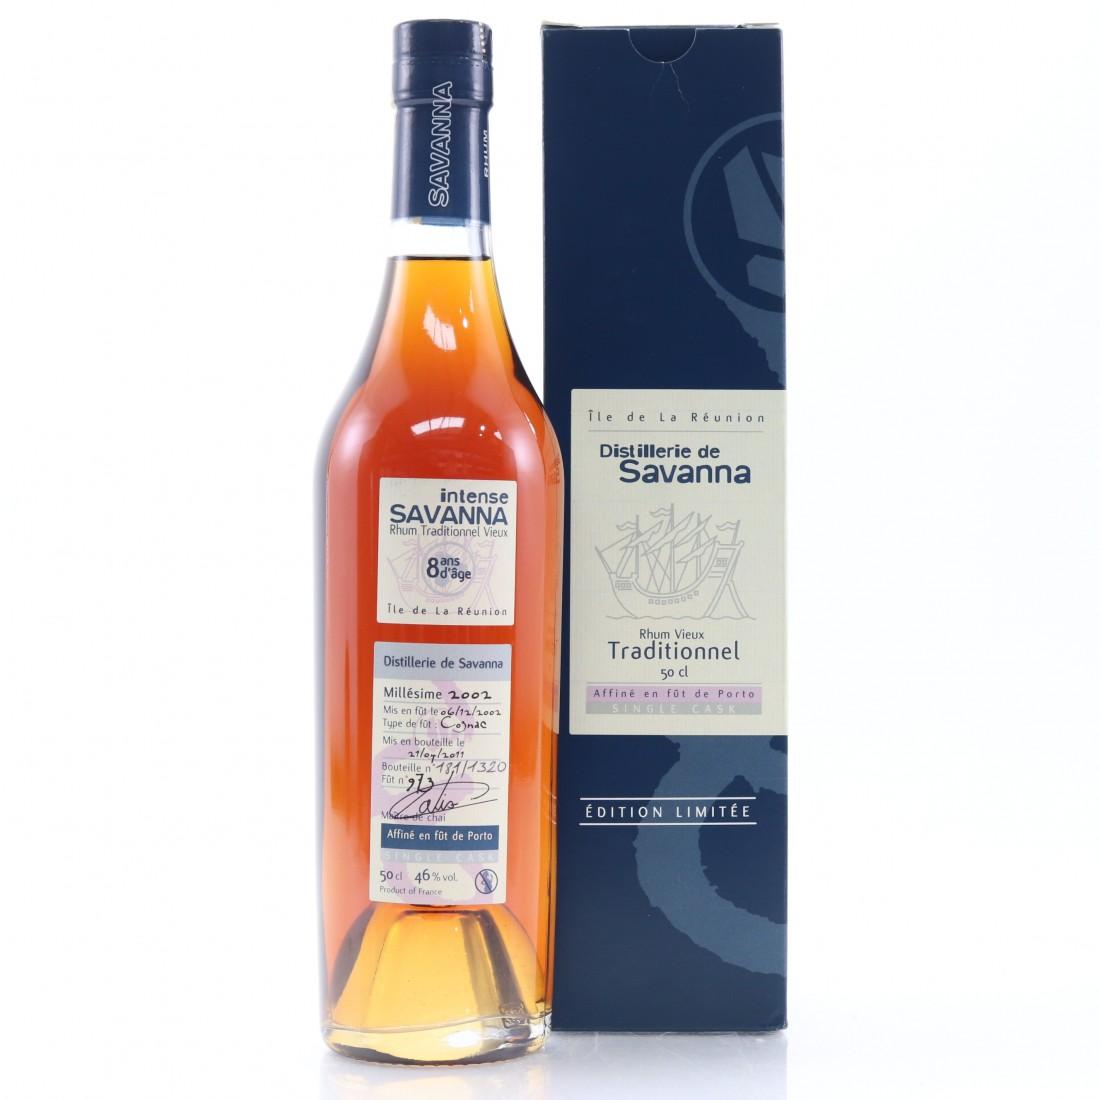 Savanna 2002 Single Cognac Cask 8 Year Old #973 50cl